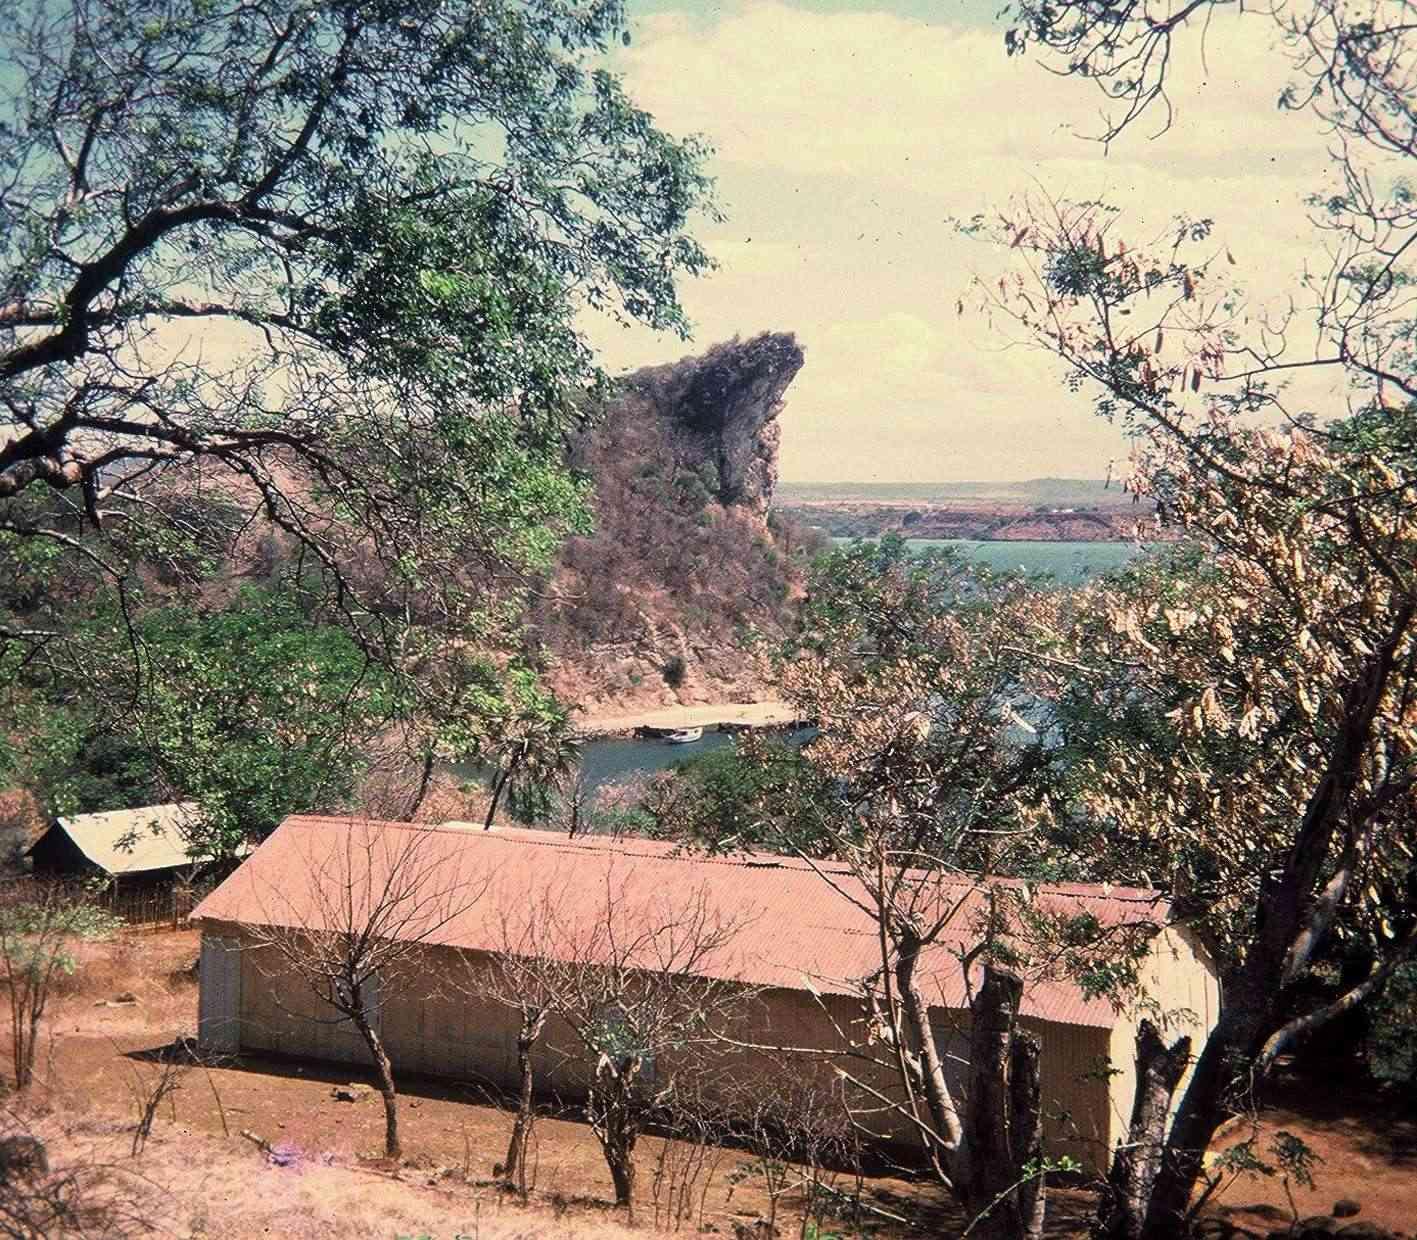 [Divers campagne Madagascar] CAP DIEGO AU CID 1972 - Page 2 Cd1_pa20